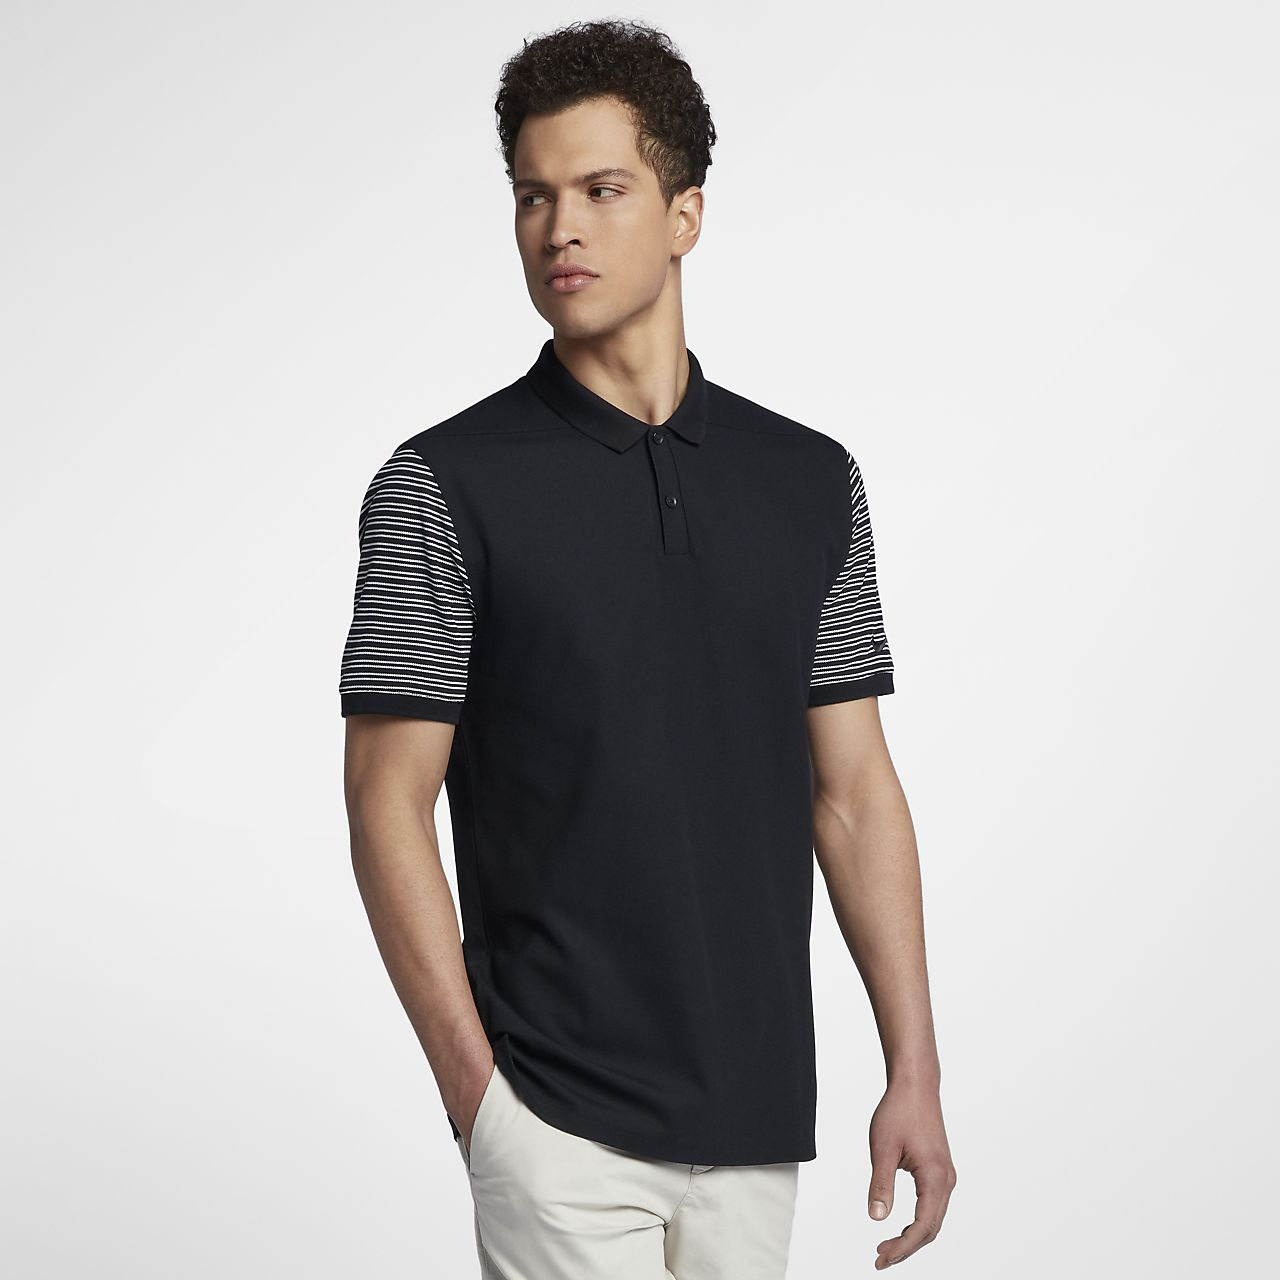 ... Nike Dri-FIT Pique Stripe Men's Standard Fit Golf Polo